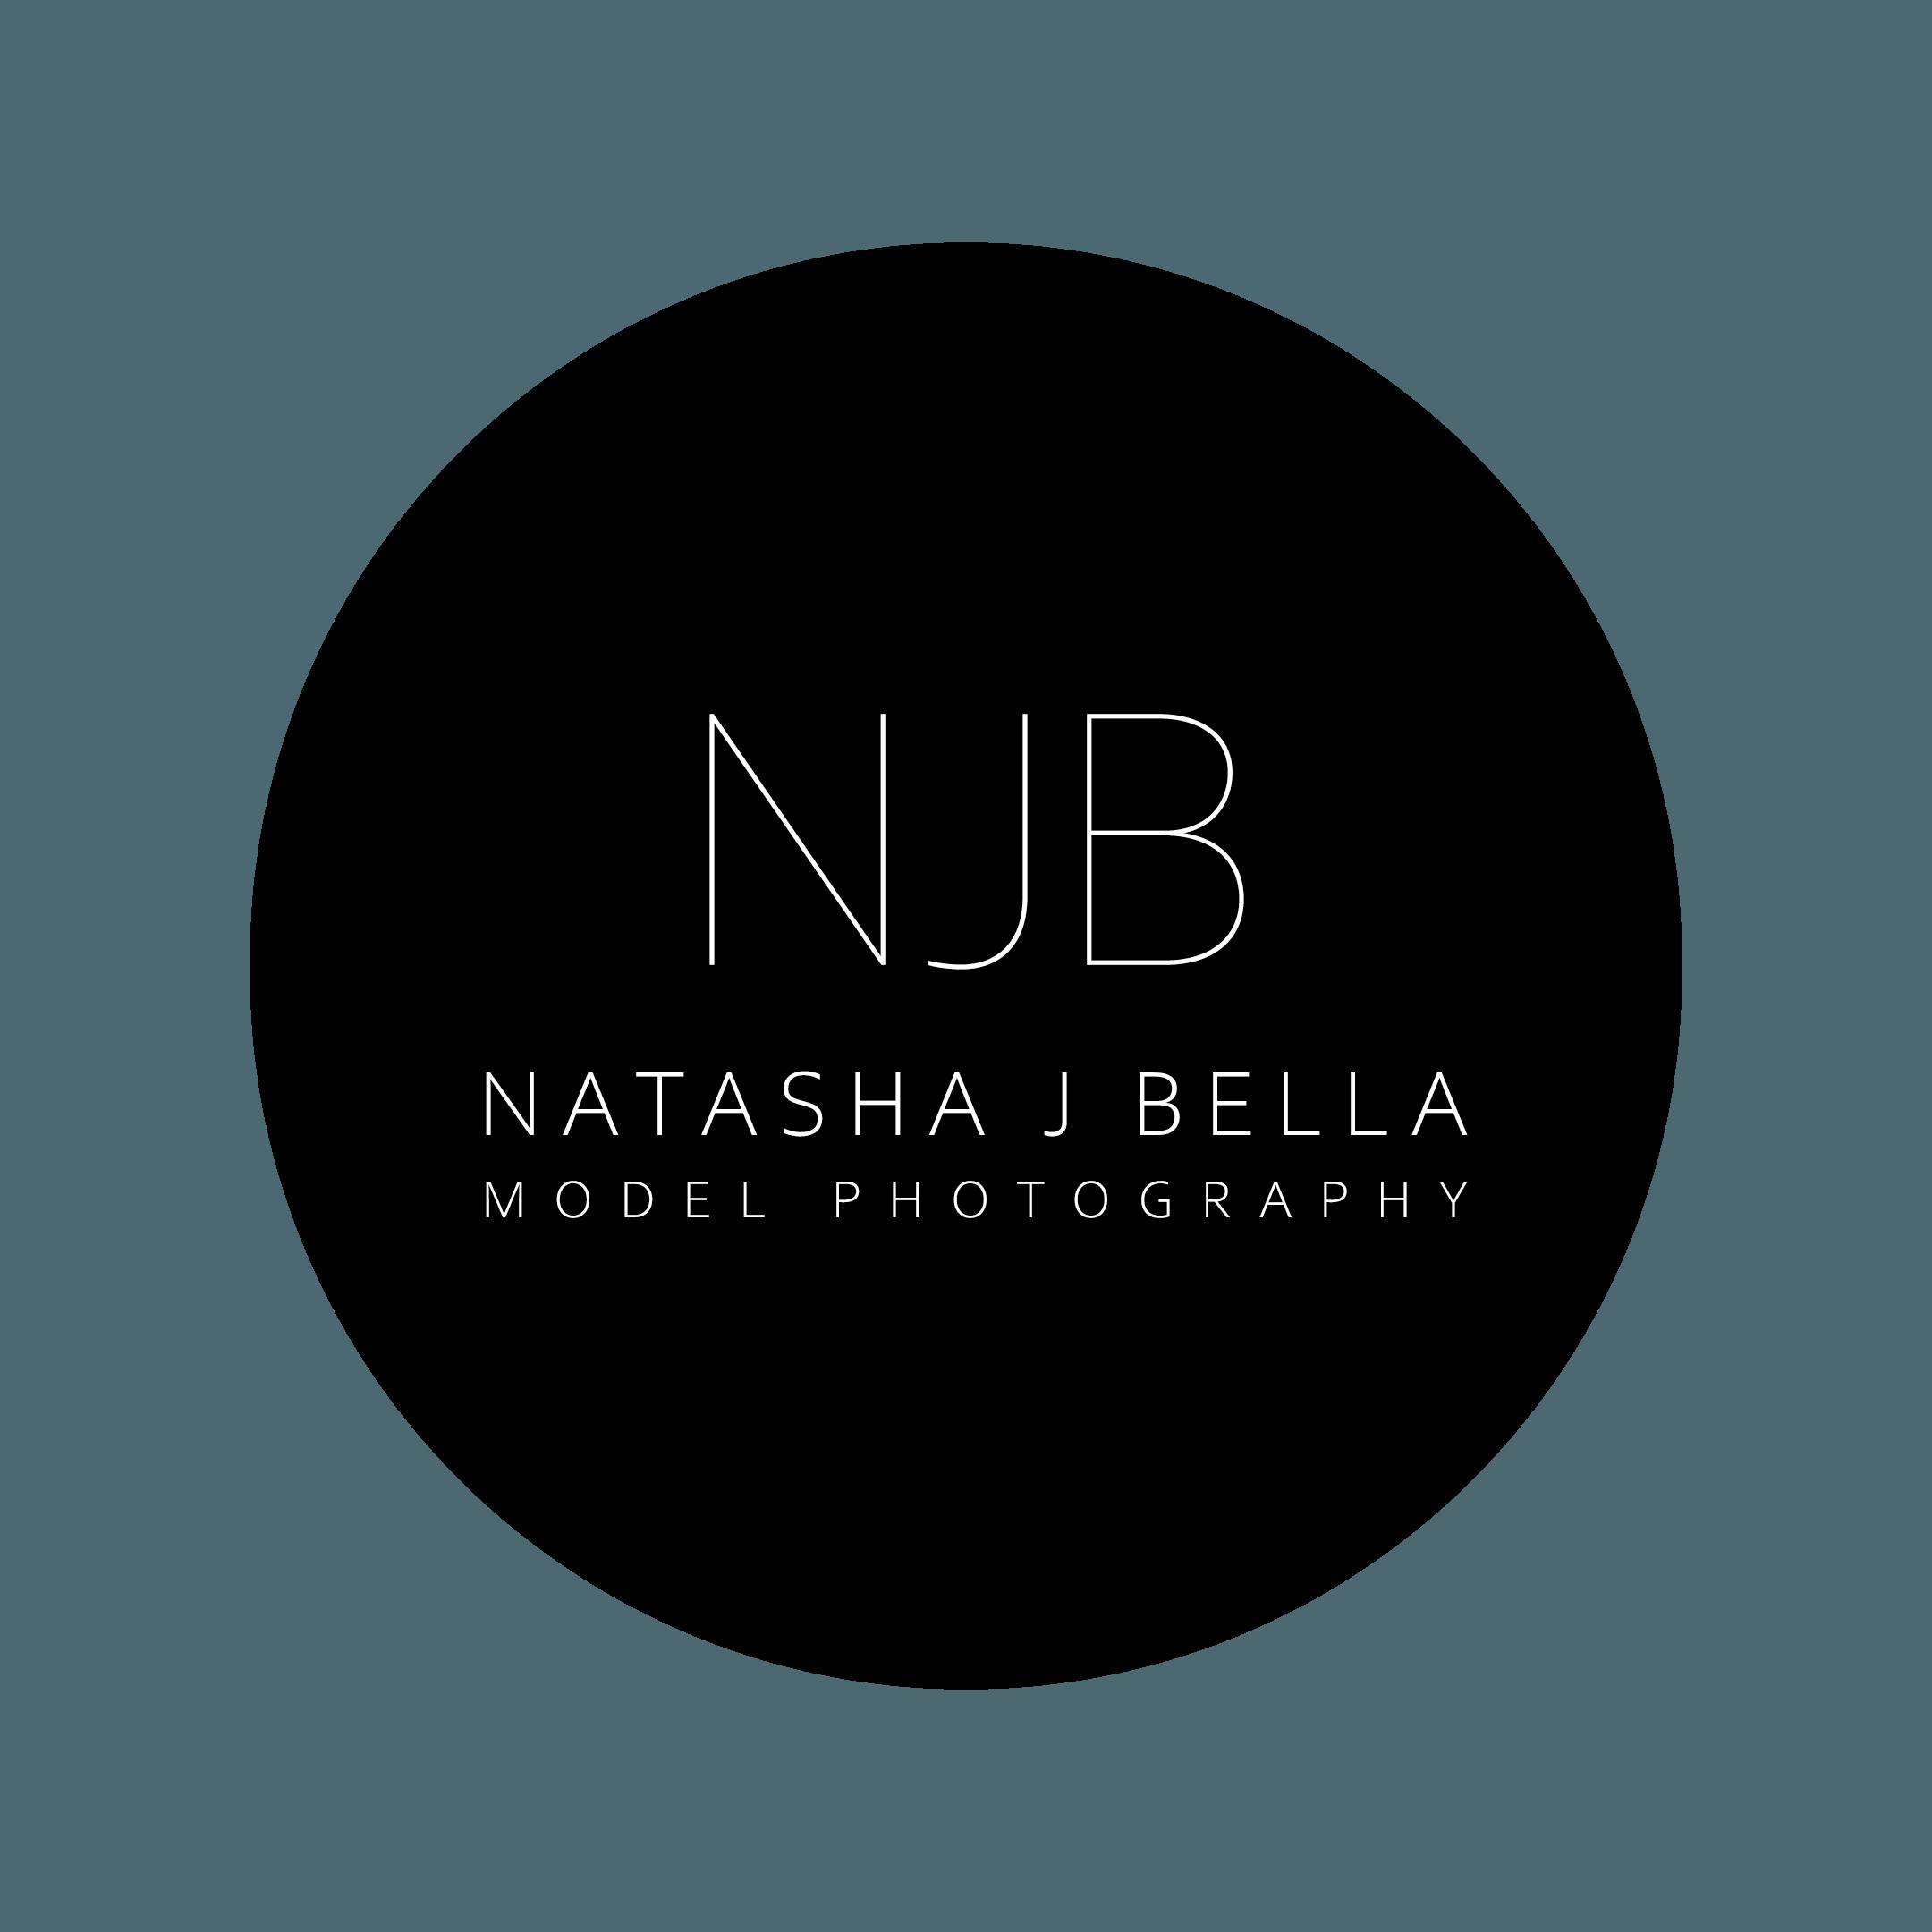 Natasha J Bella